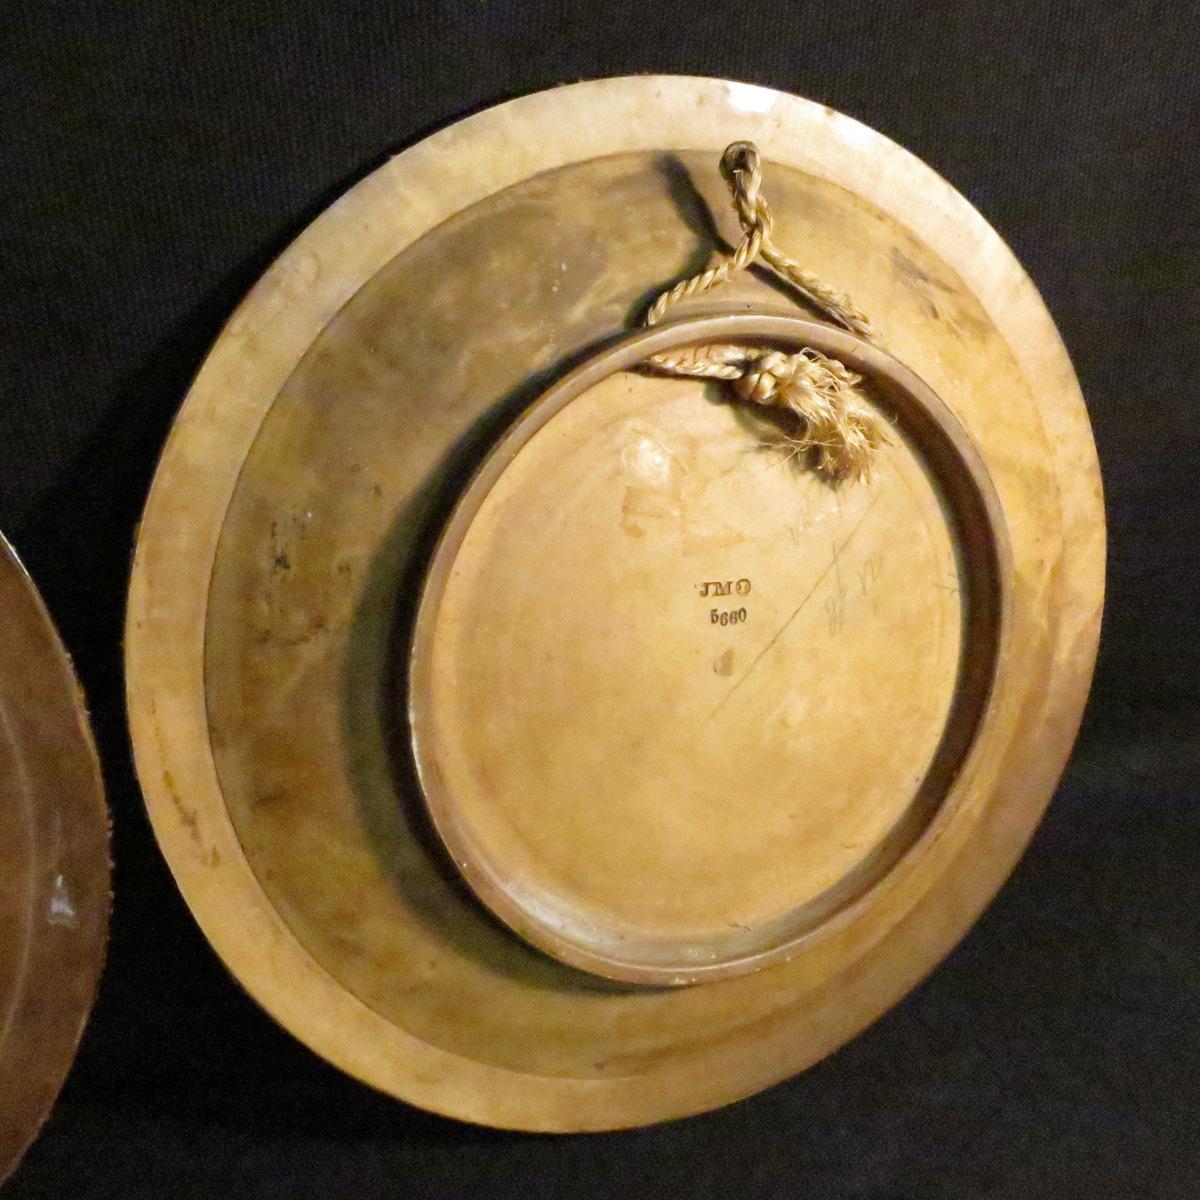 Johann Maresch Pair Of Plates Plates Pottery Central European Gypsies-photo-7